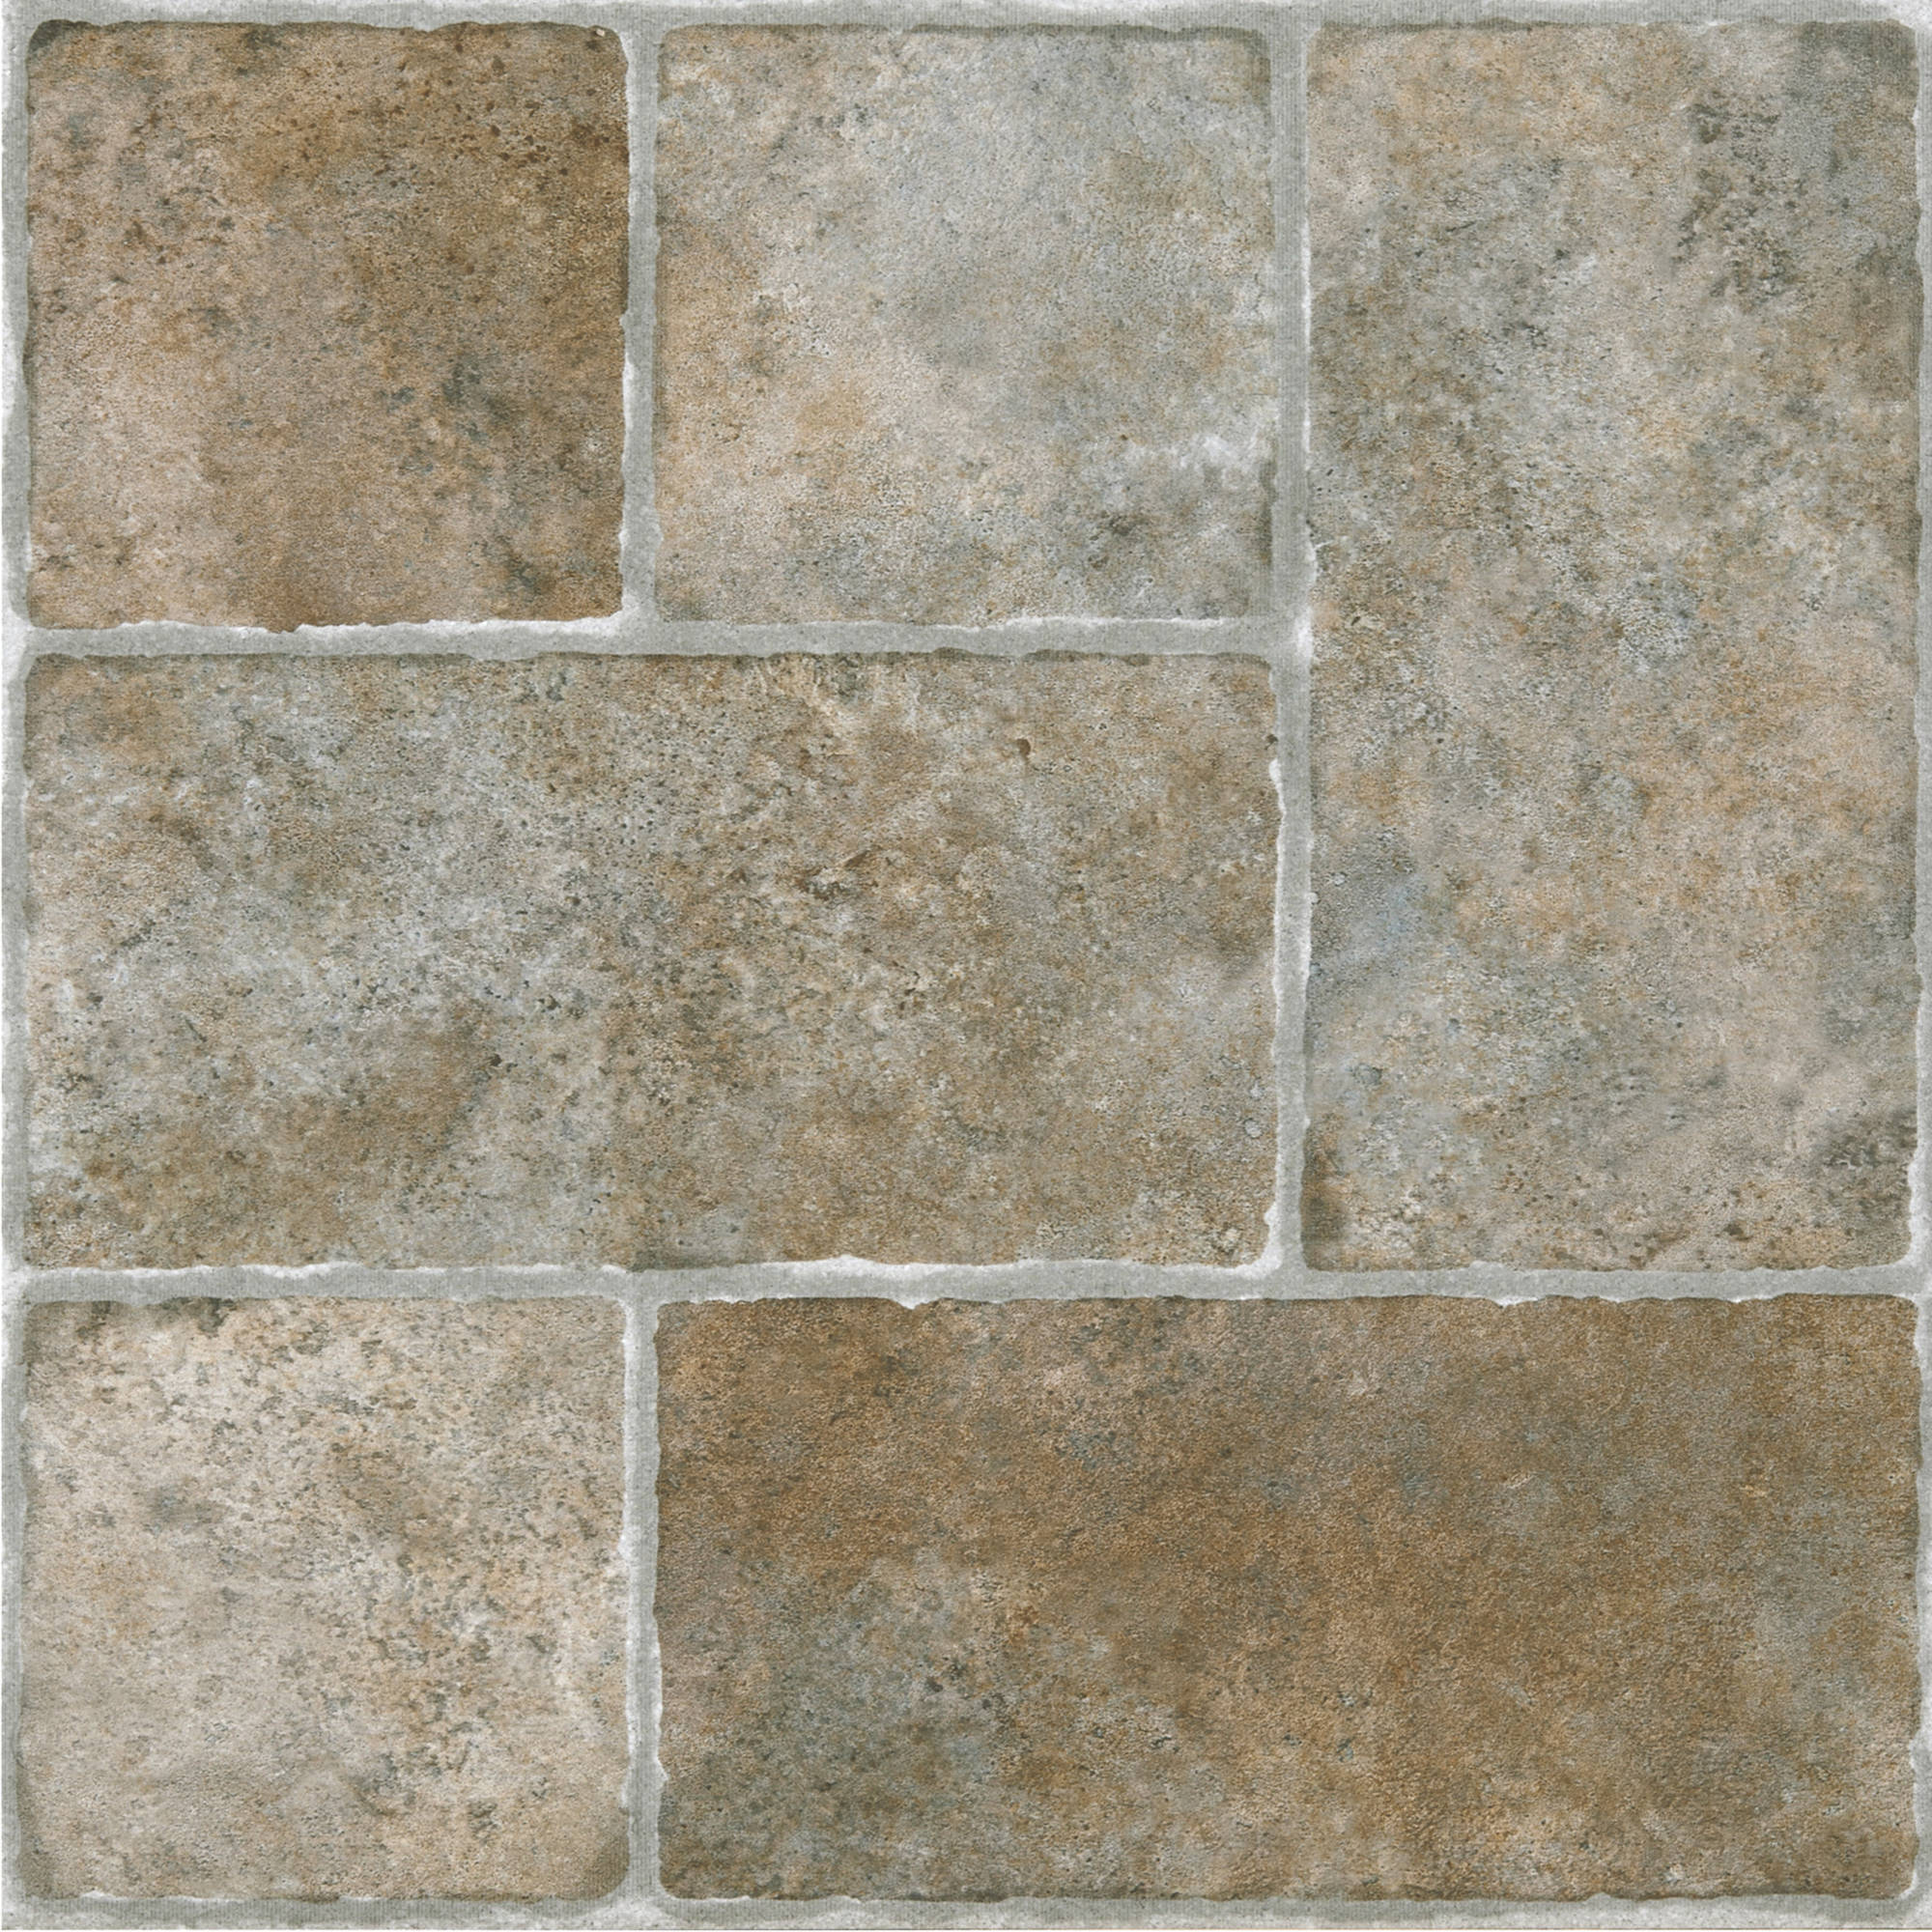 nexus quartose granite 12x12 self adhesive vinyl floor tile - 20 tiles/20 ZMUSSZJ